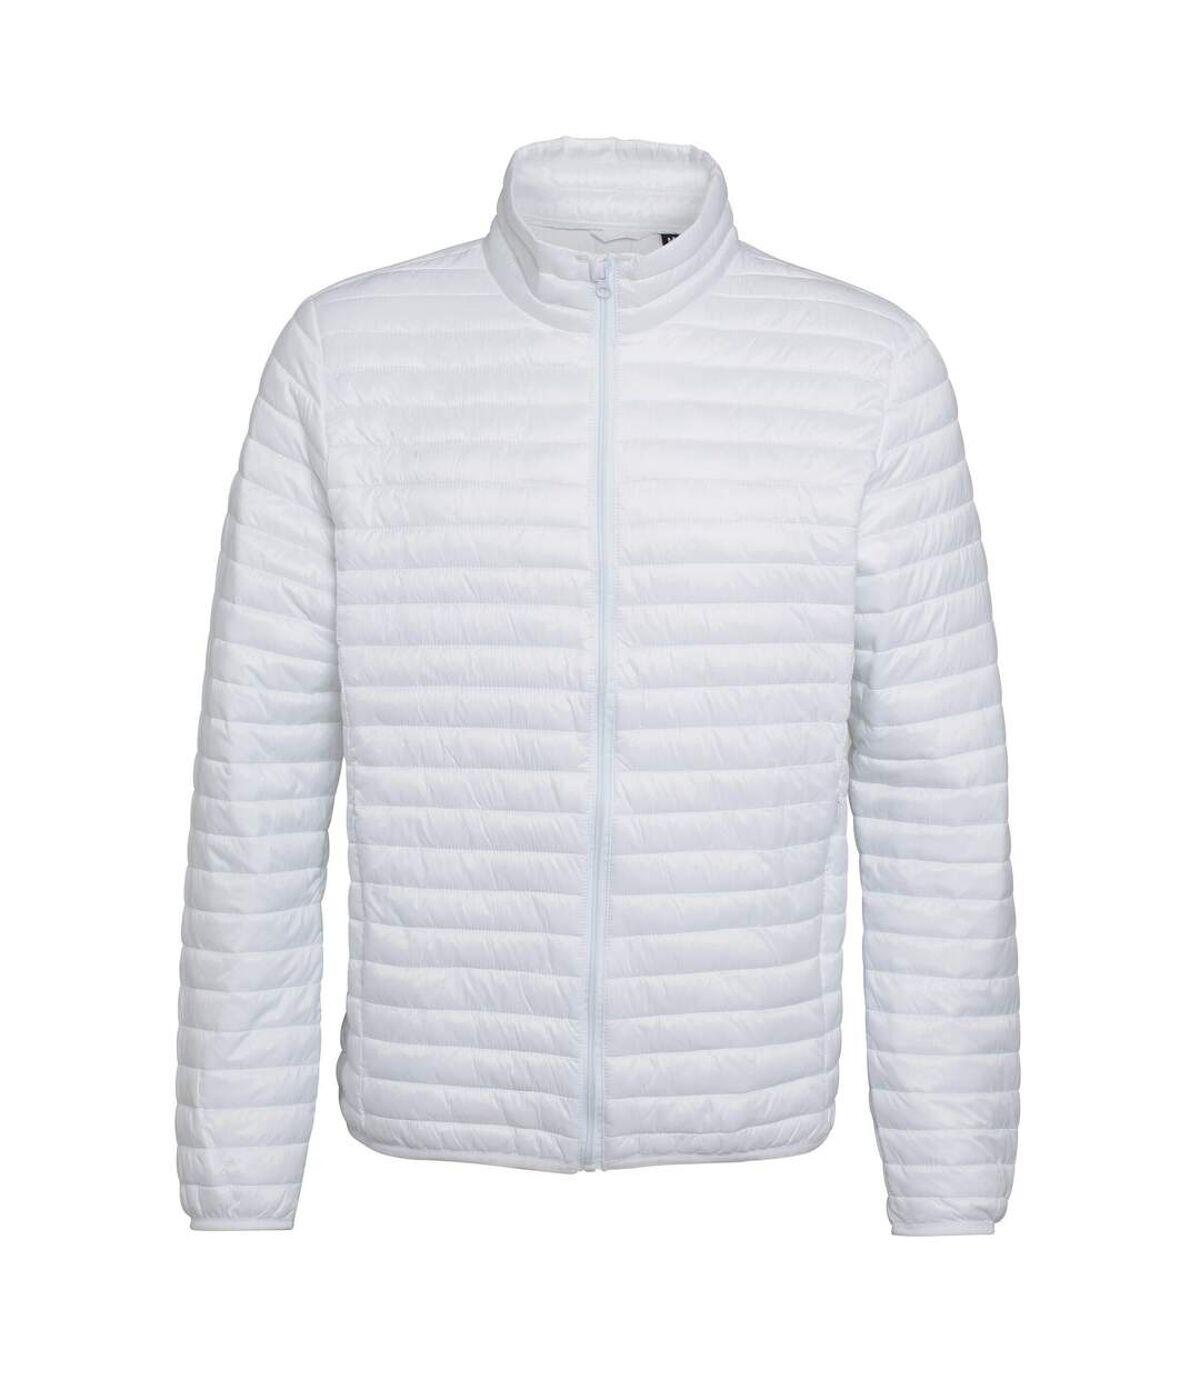 2786 Mens Tribe Fineline Padded Jacket (White) - UTRW3846